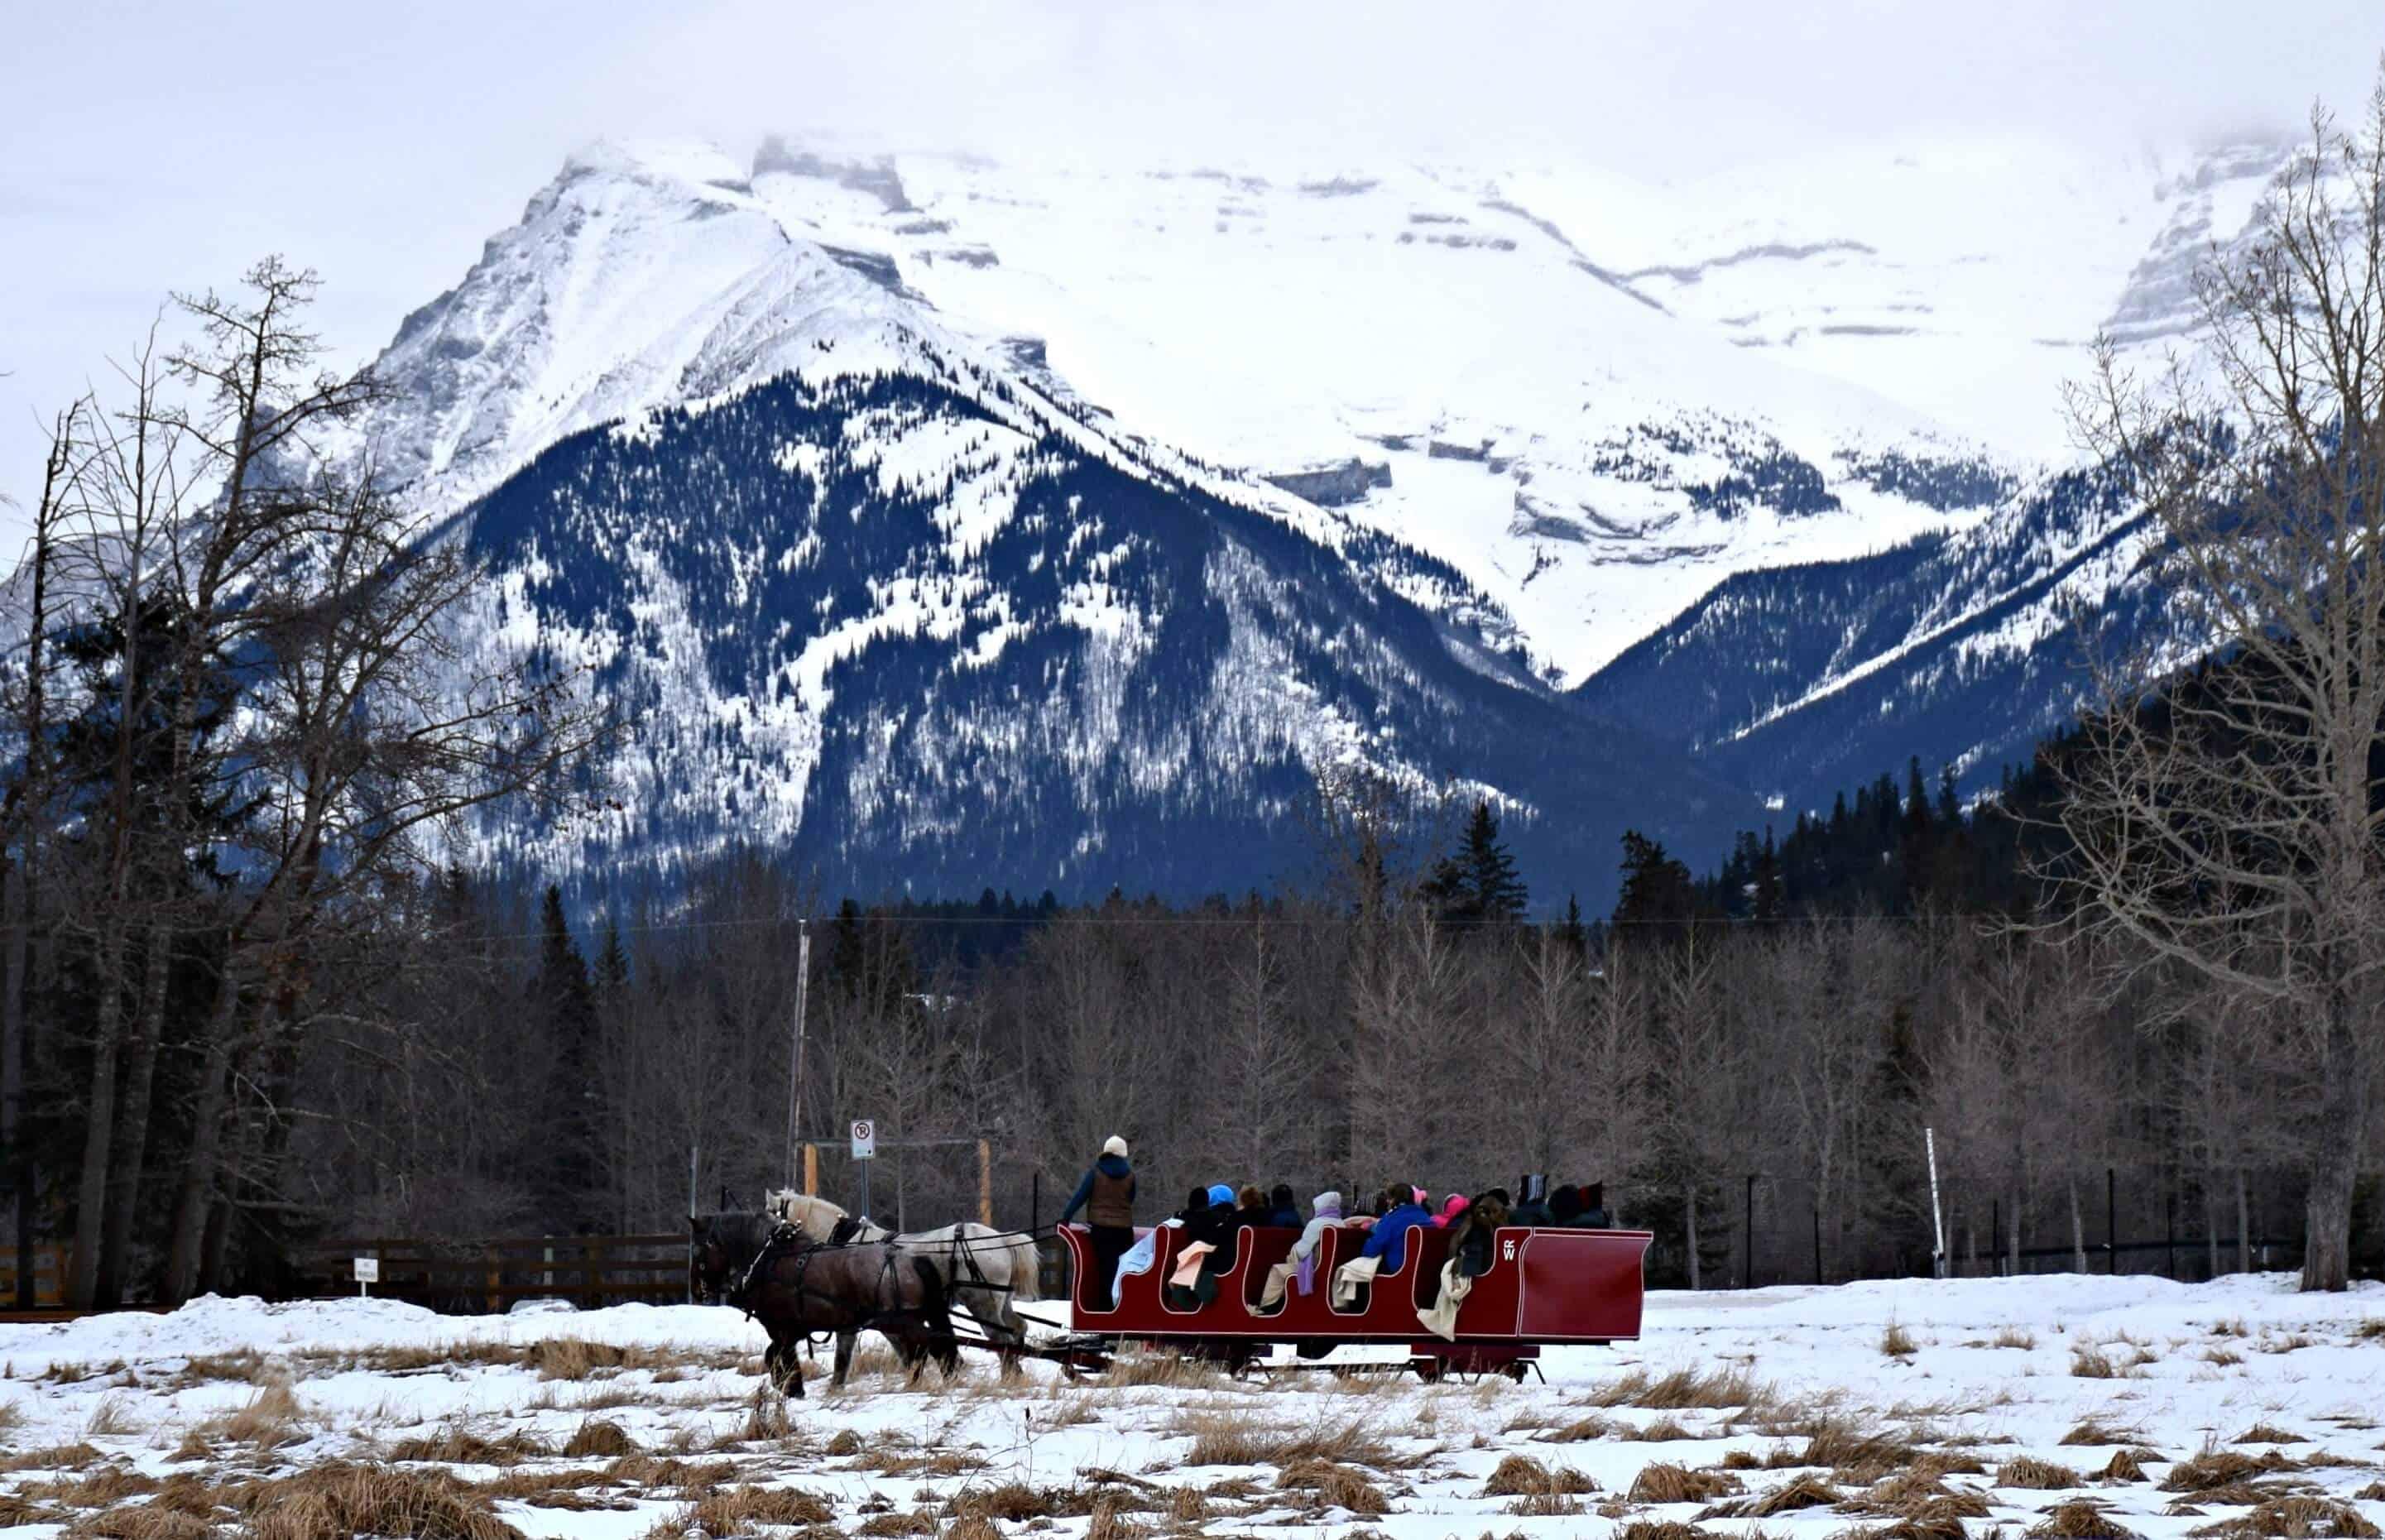 Sleigh Ride, Banff, Alberta, Canada